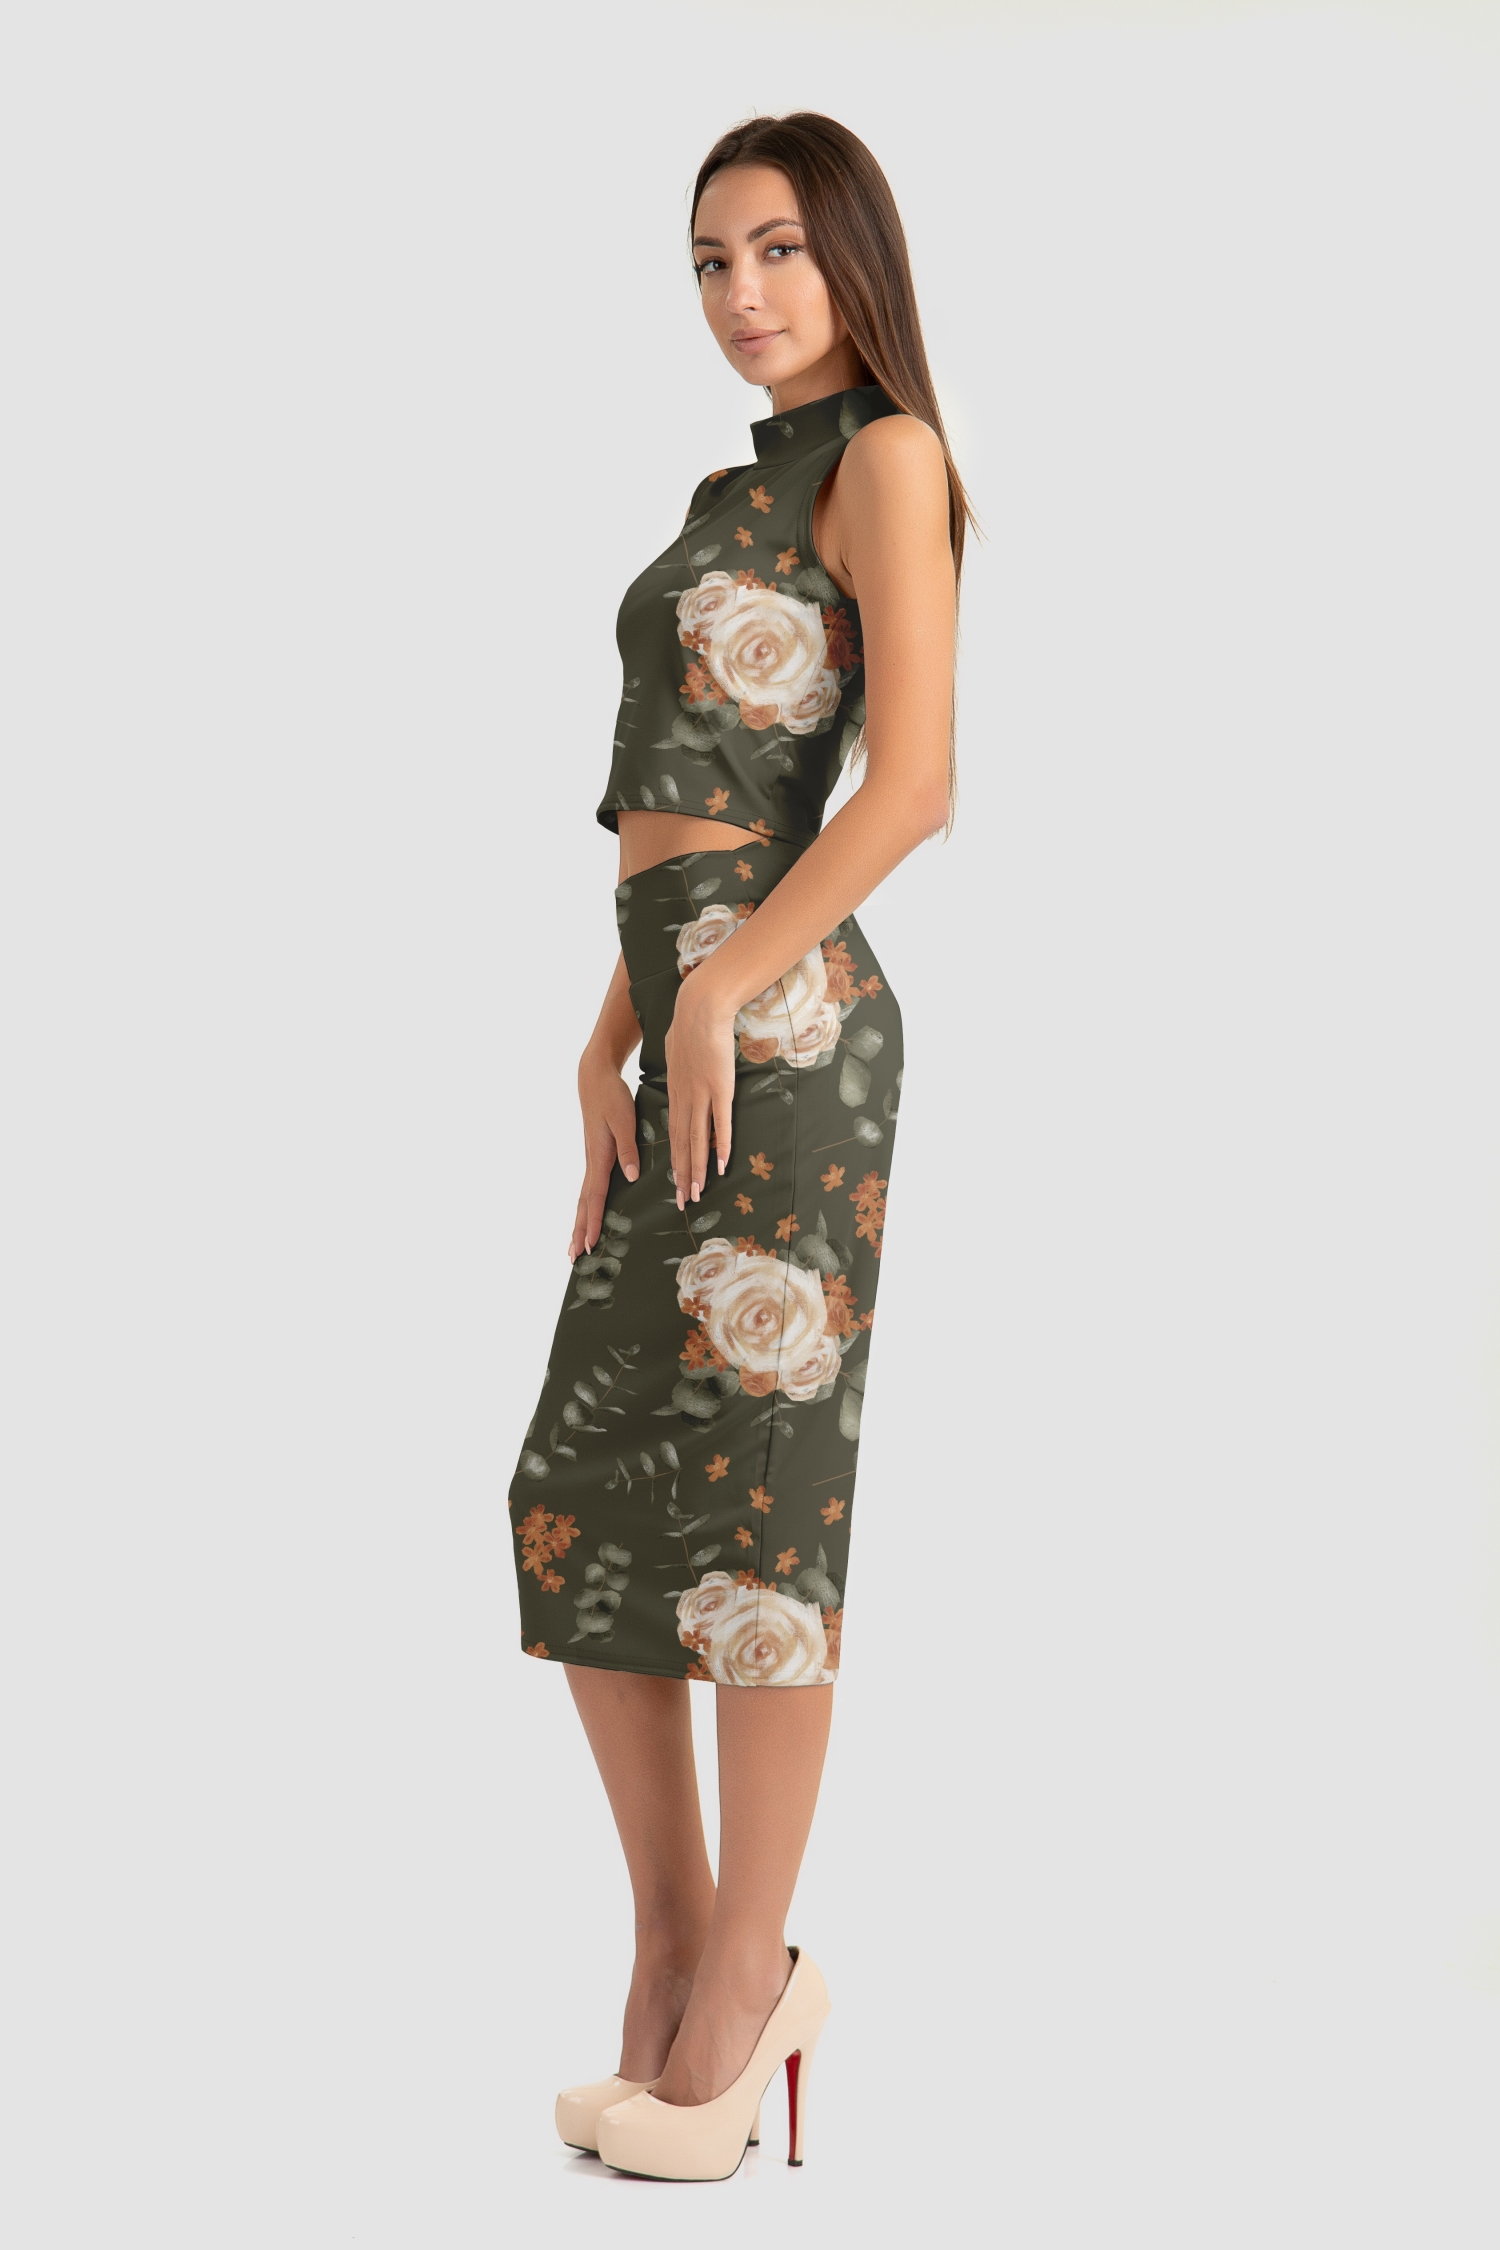 1582685547 41dc3de6482bc38 - 高端连衣裙裙子样机